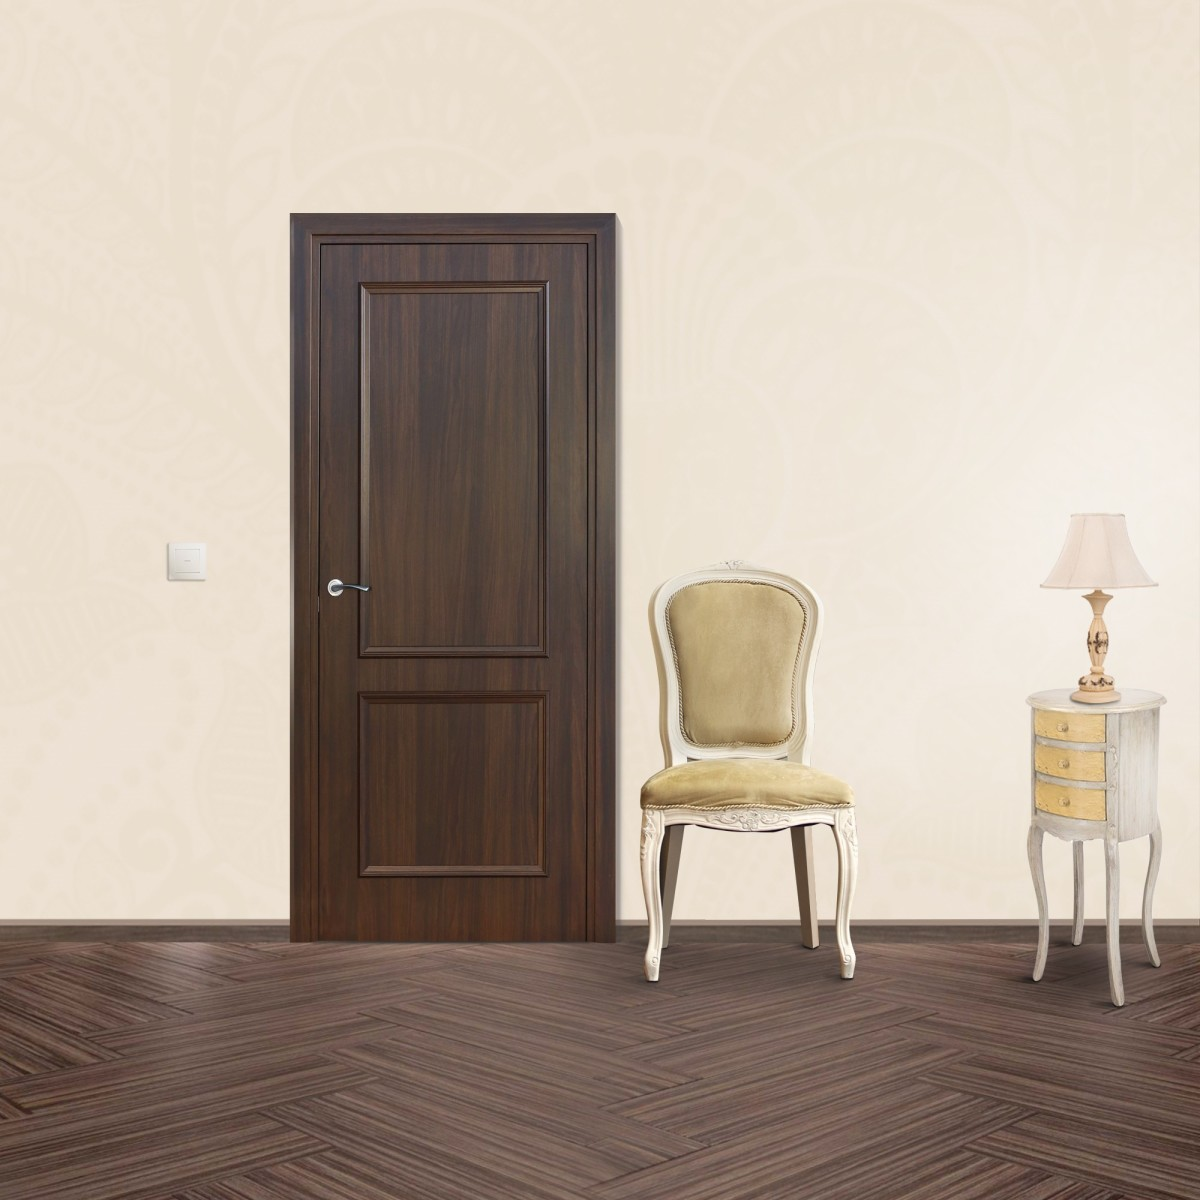 Дверь Межкомнатная Глухая Altro 90x200 Ламинация Цвет Орех Марроне